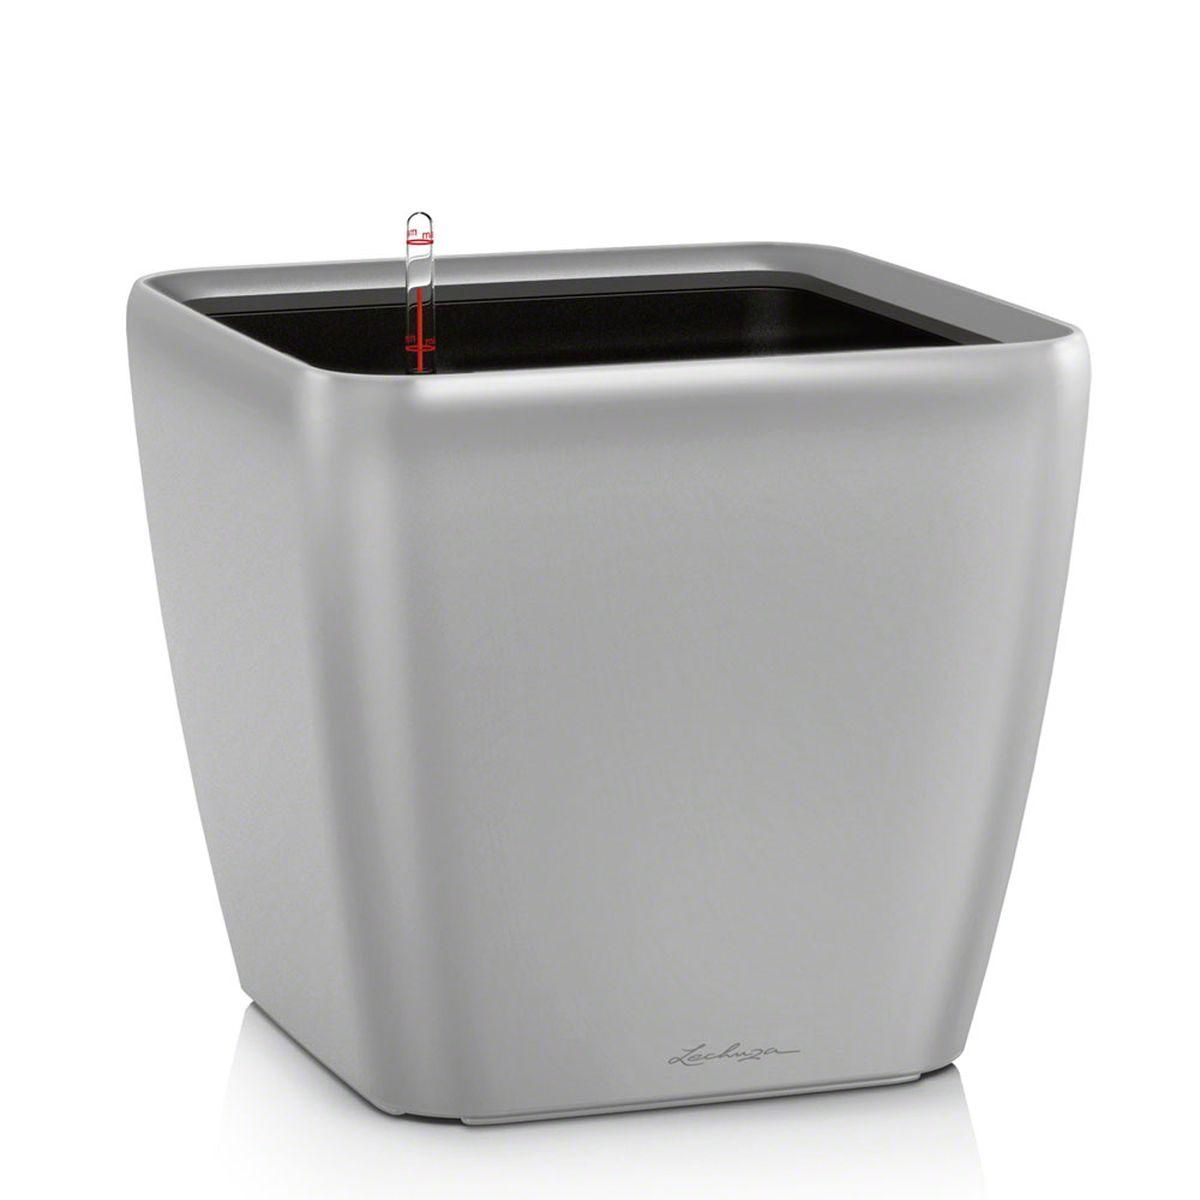 "Кашпо Lechuza ""Quadro"", с системой автополива, цвет: серебристый, 21 х 21 х 20 см"